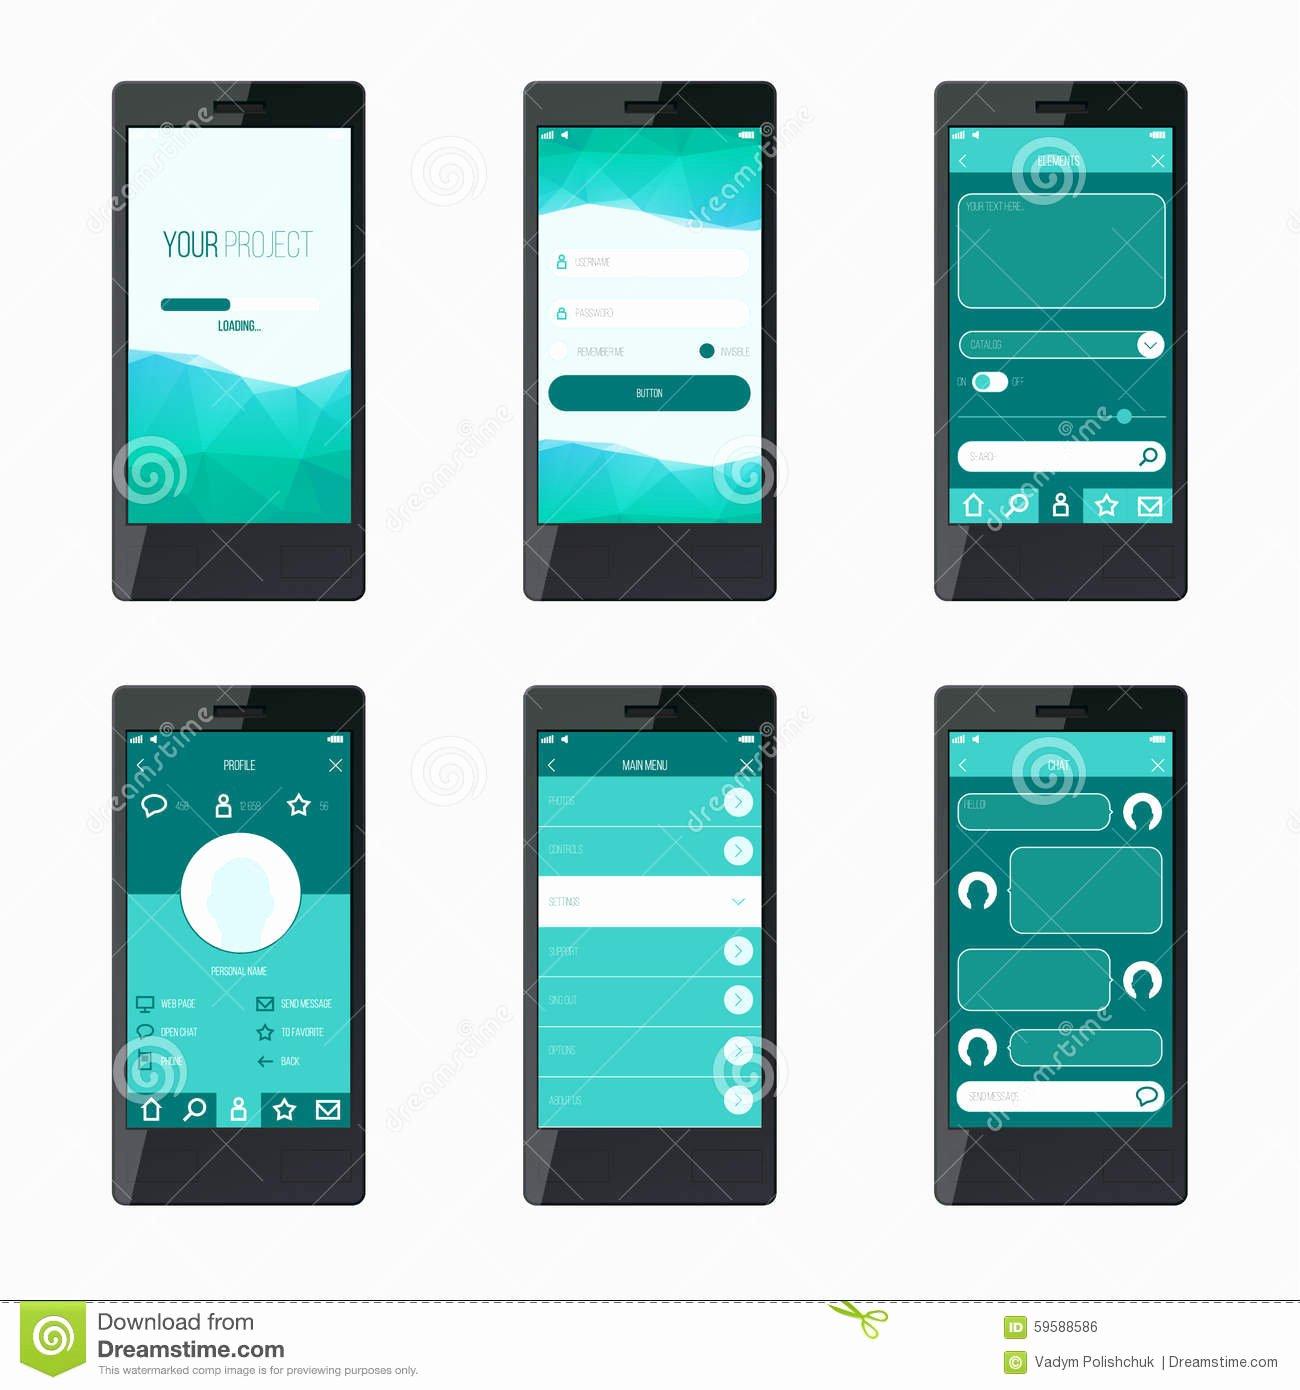 Mobile App Design Template Unique Template Mobile Application Interface Design Stock Vector